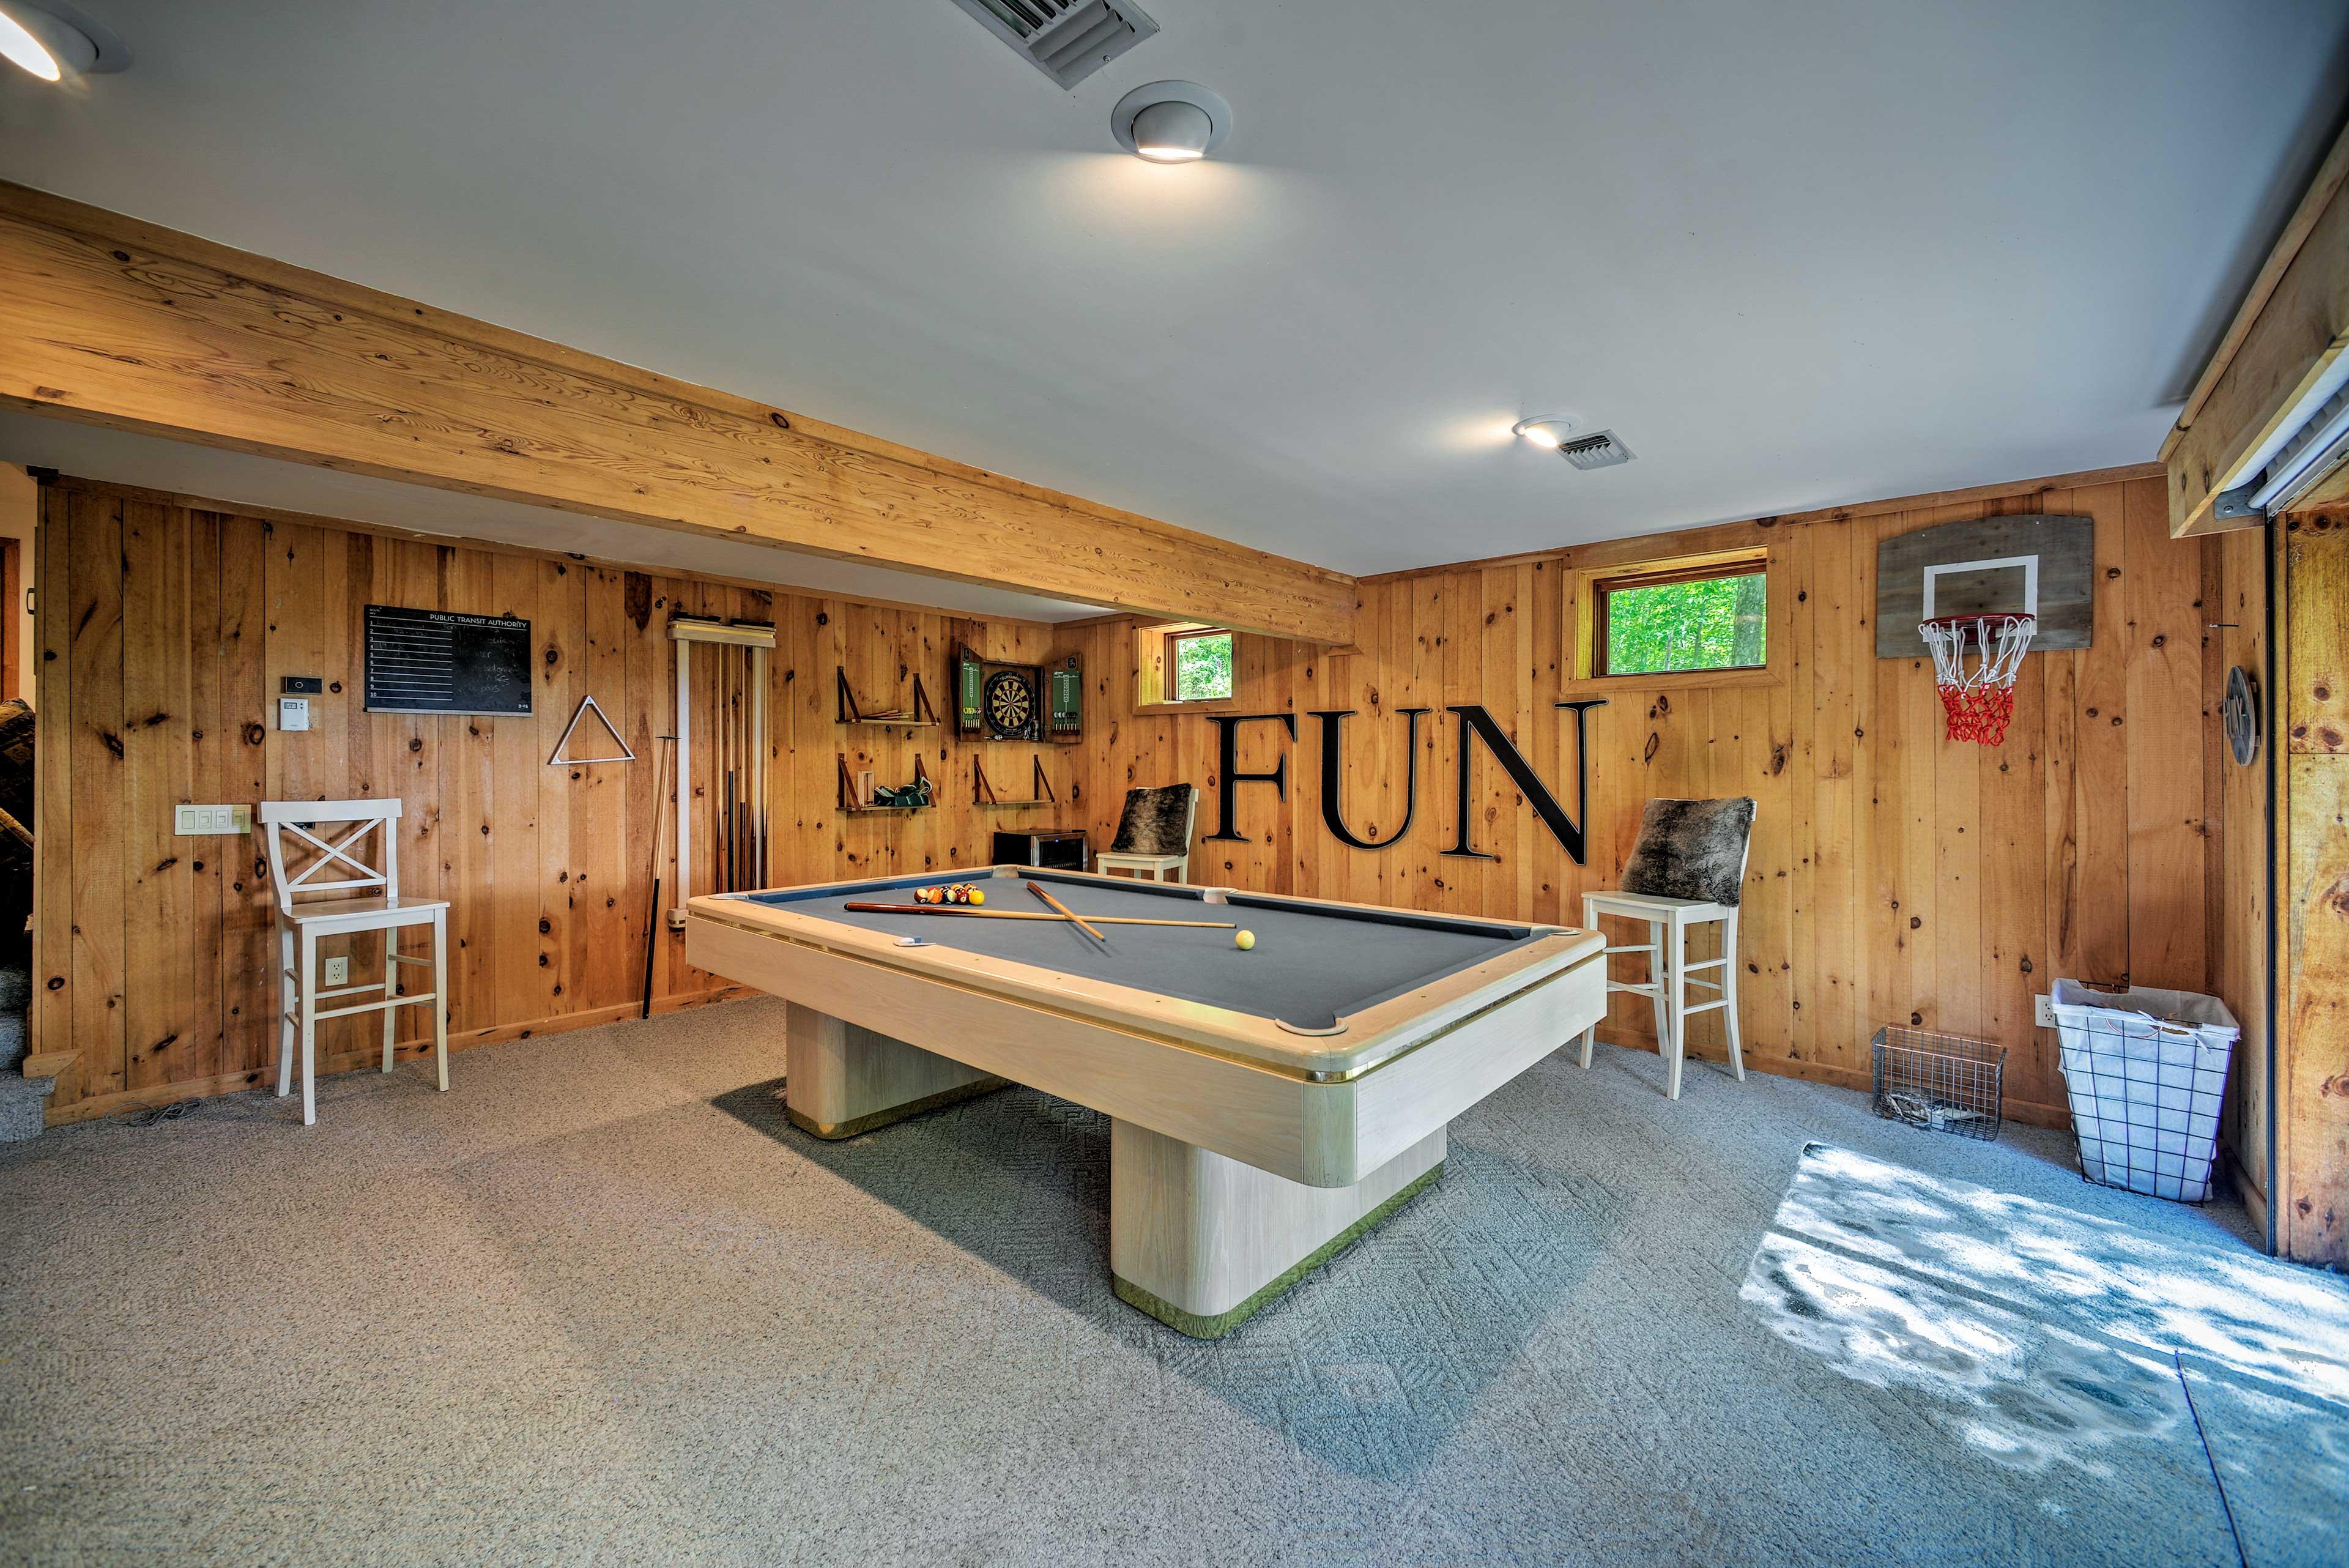 Game Room | Pool Table | Darts | Mini Basketball Hoop